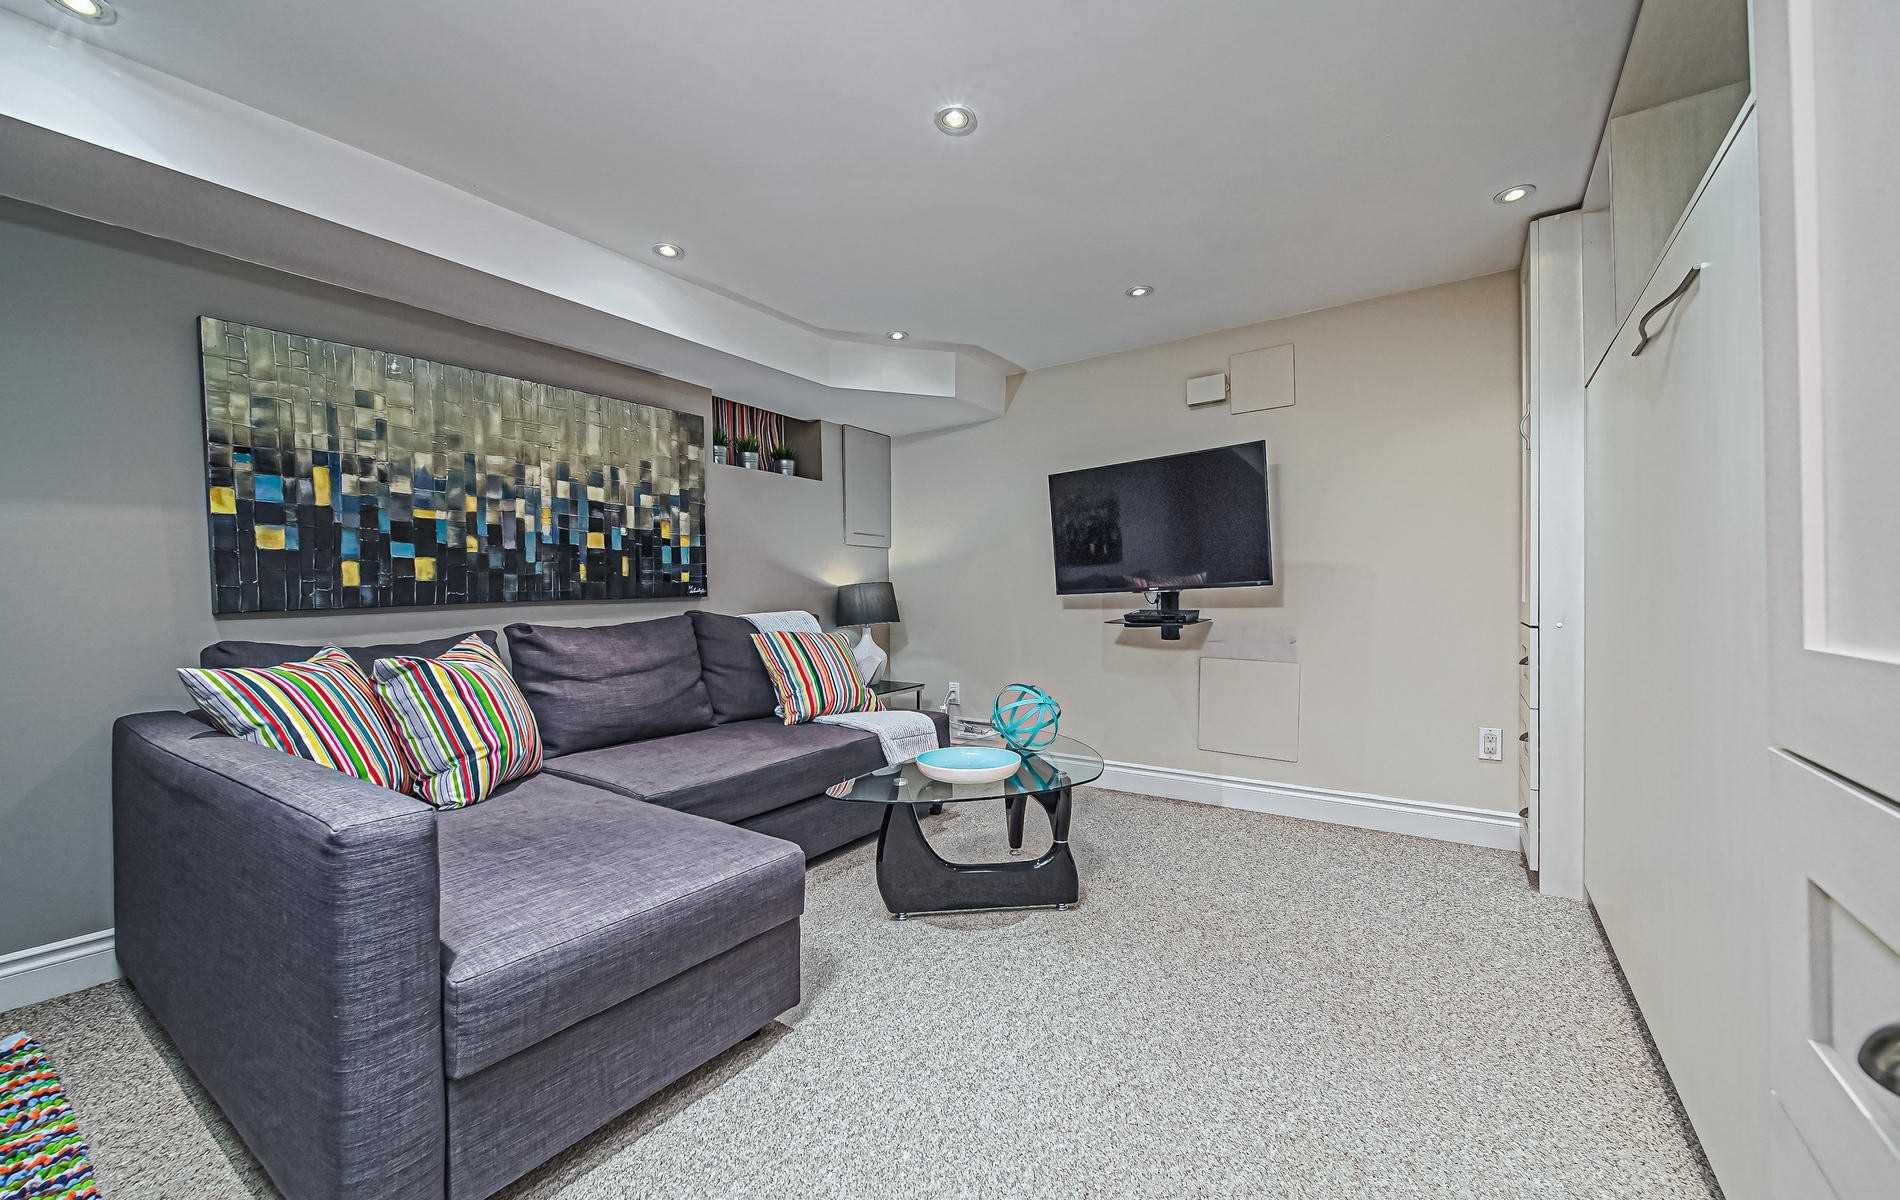 Photo 15: Photos: 84 Rushbrooke Avenue in Toronto: South Riverdale House (2-Storey) for sale (Toronto E01)  : MLS®# E4600791